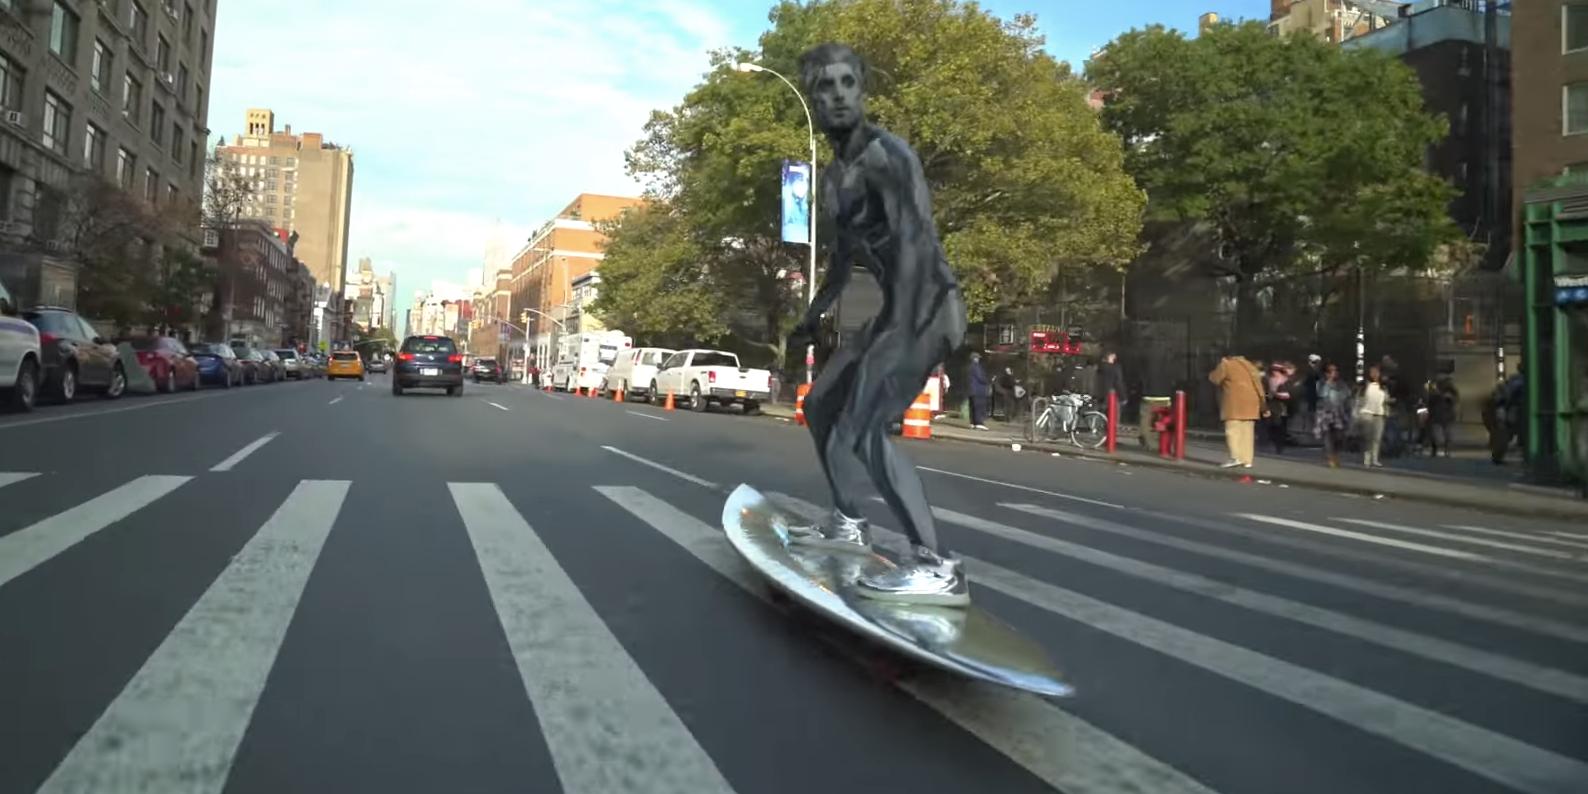 This Silver Surfer Shredding Downtown Manhattan